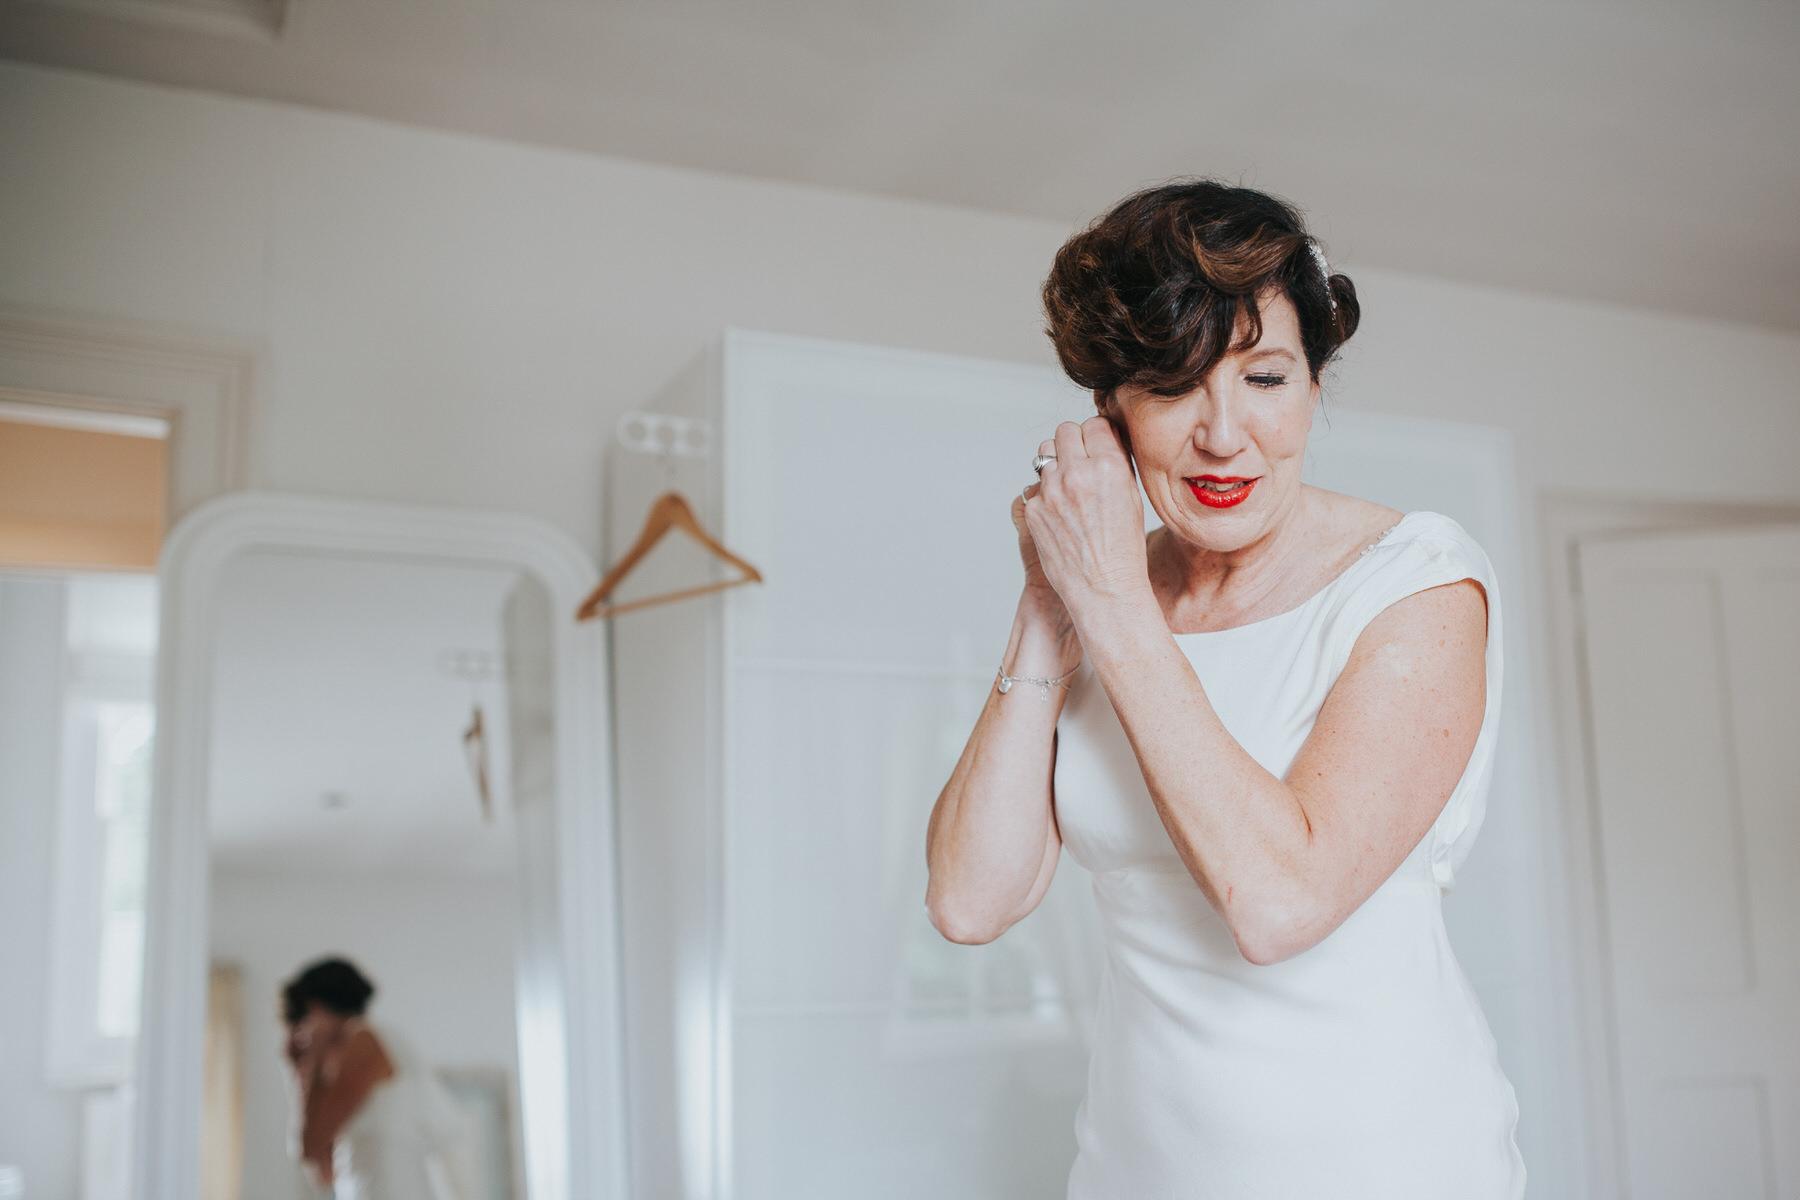 31 bride clipping earing Ghost wedding dress London.jpg